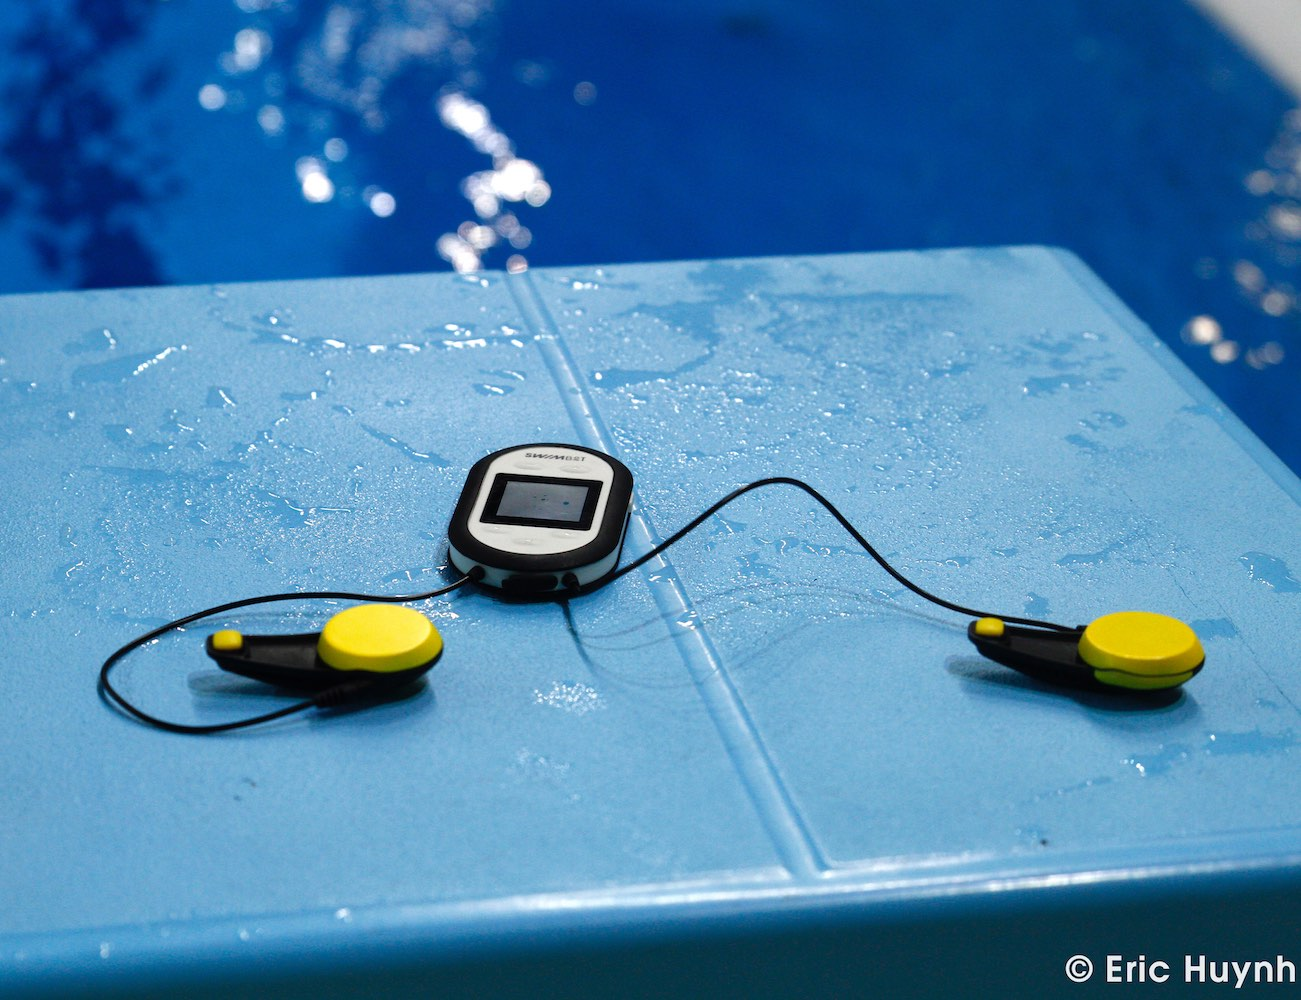 Swimbot+%26%238211%3B+Better+On+Technique+When+Swimming%21